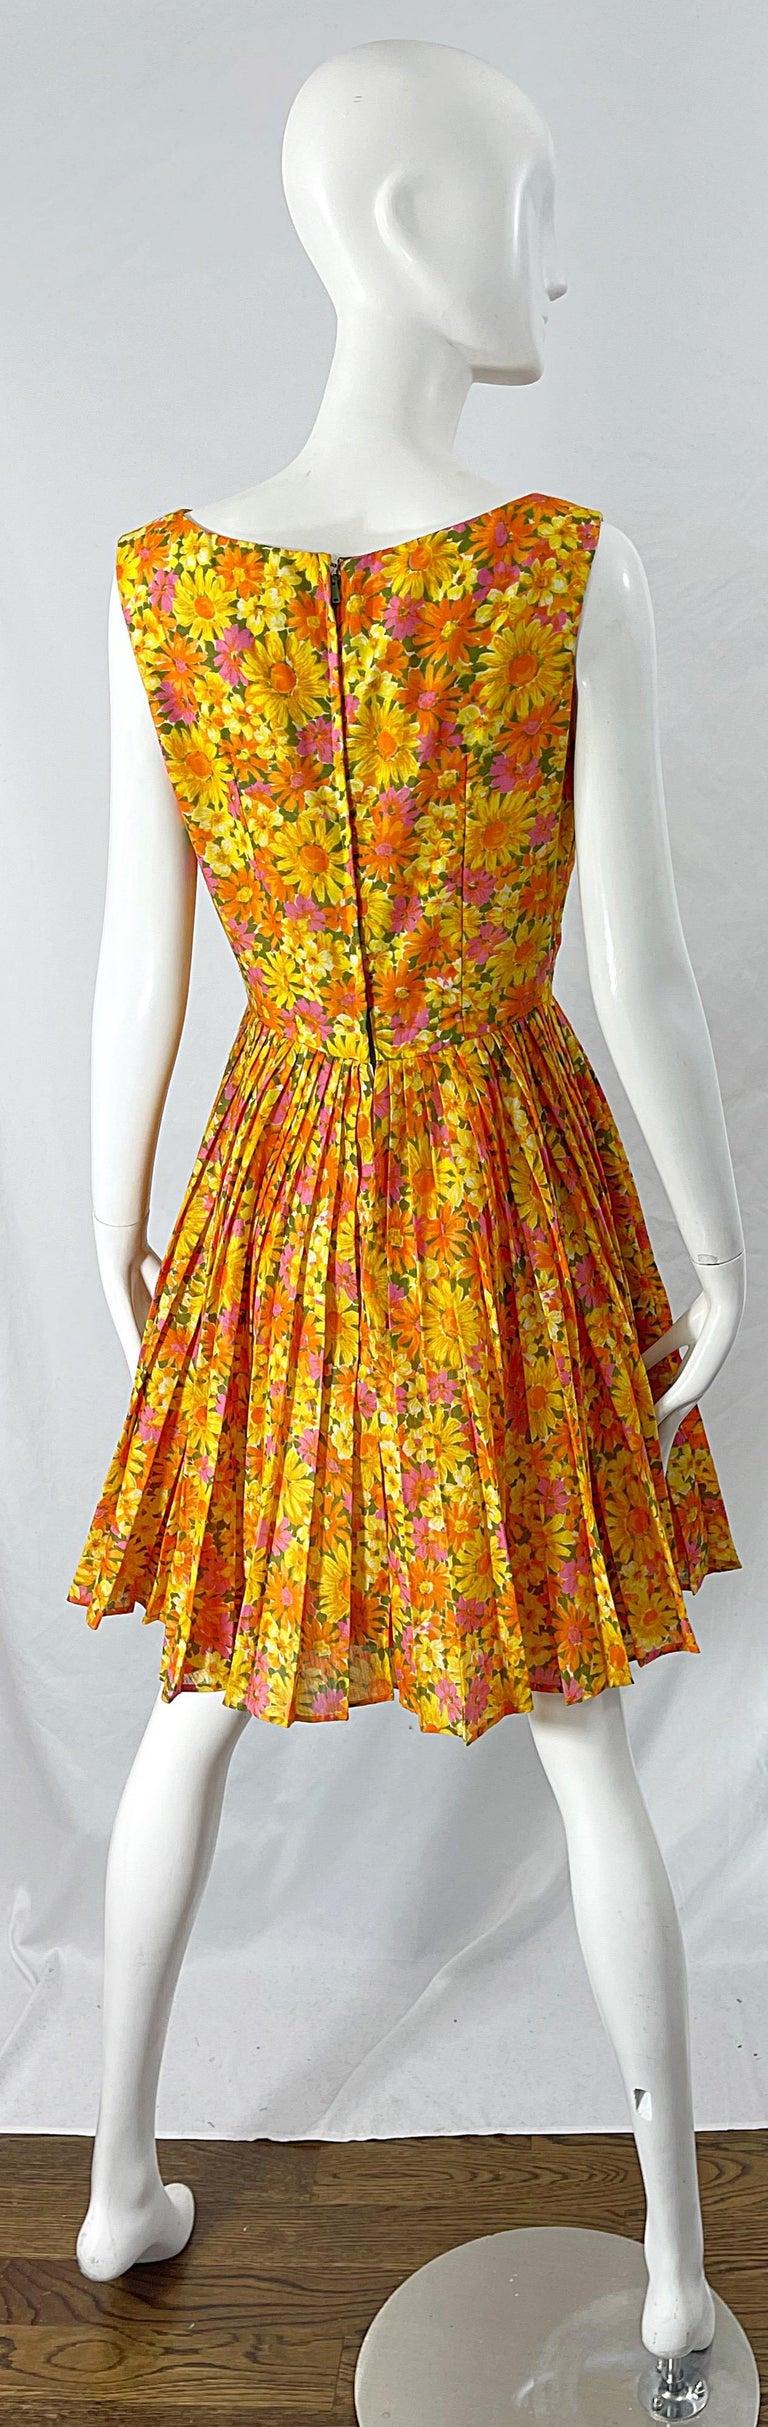 1950s Suzy Perette Yellow Pink Orange Daisy Print Cotton Vintage 50s Dress For Sale 7